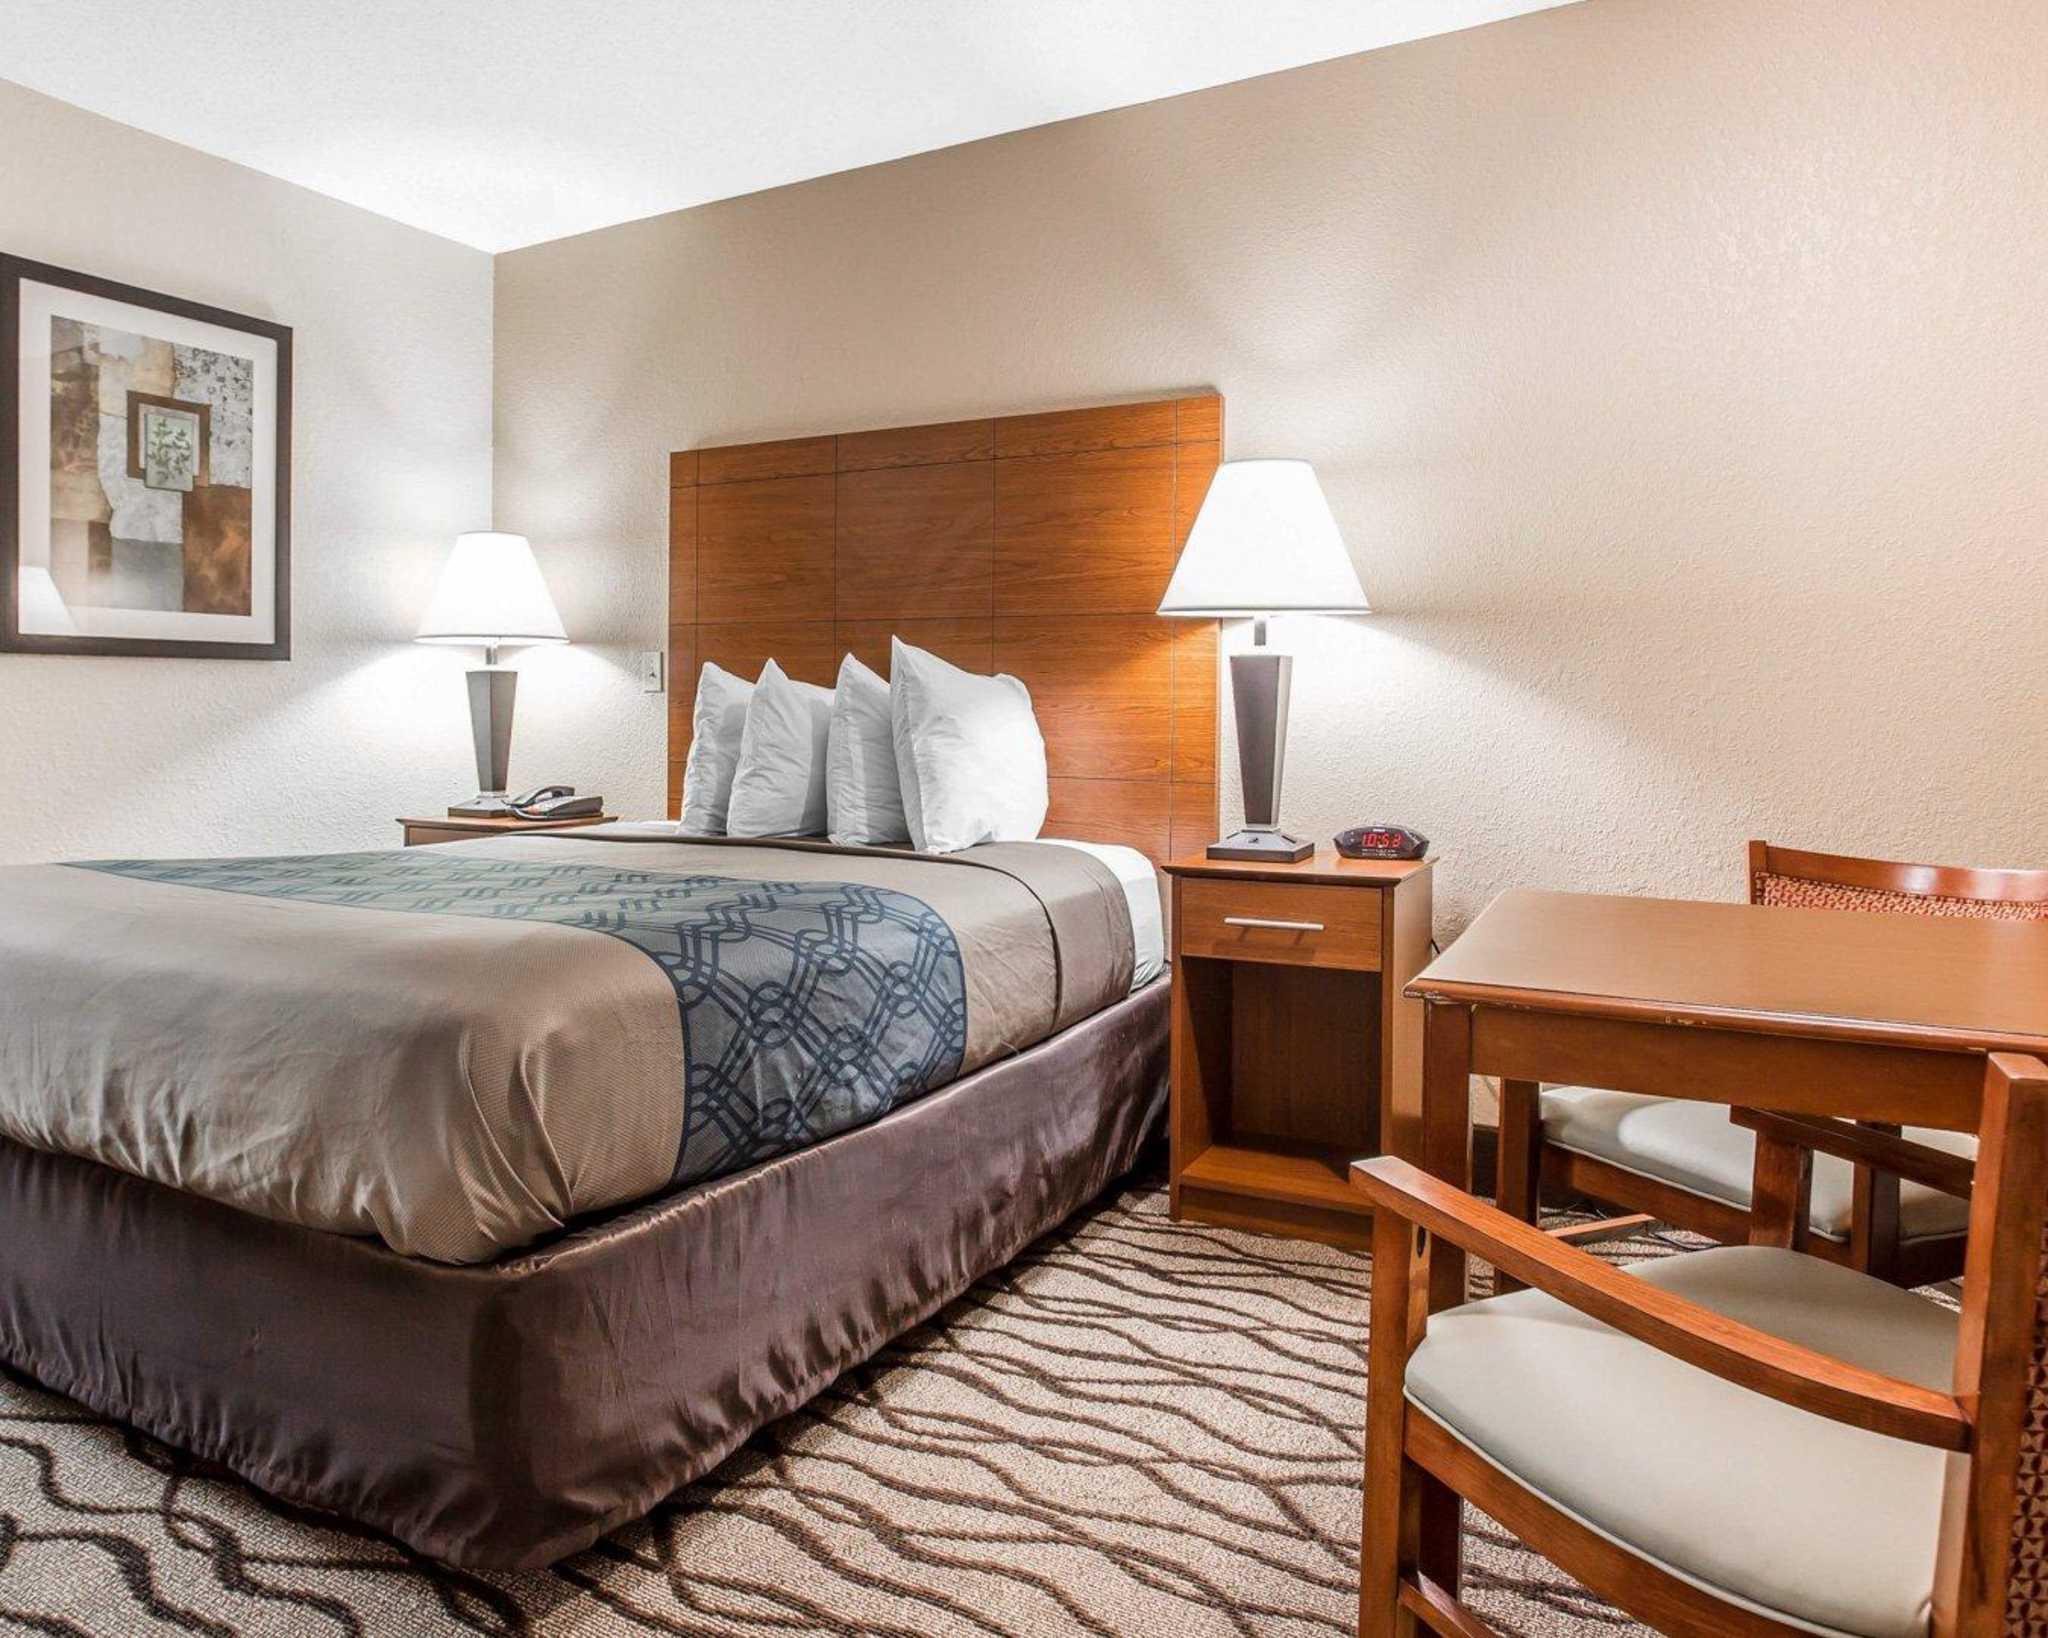 Econo Lodge Inn & Suites image 12